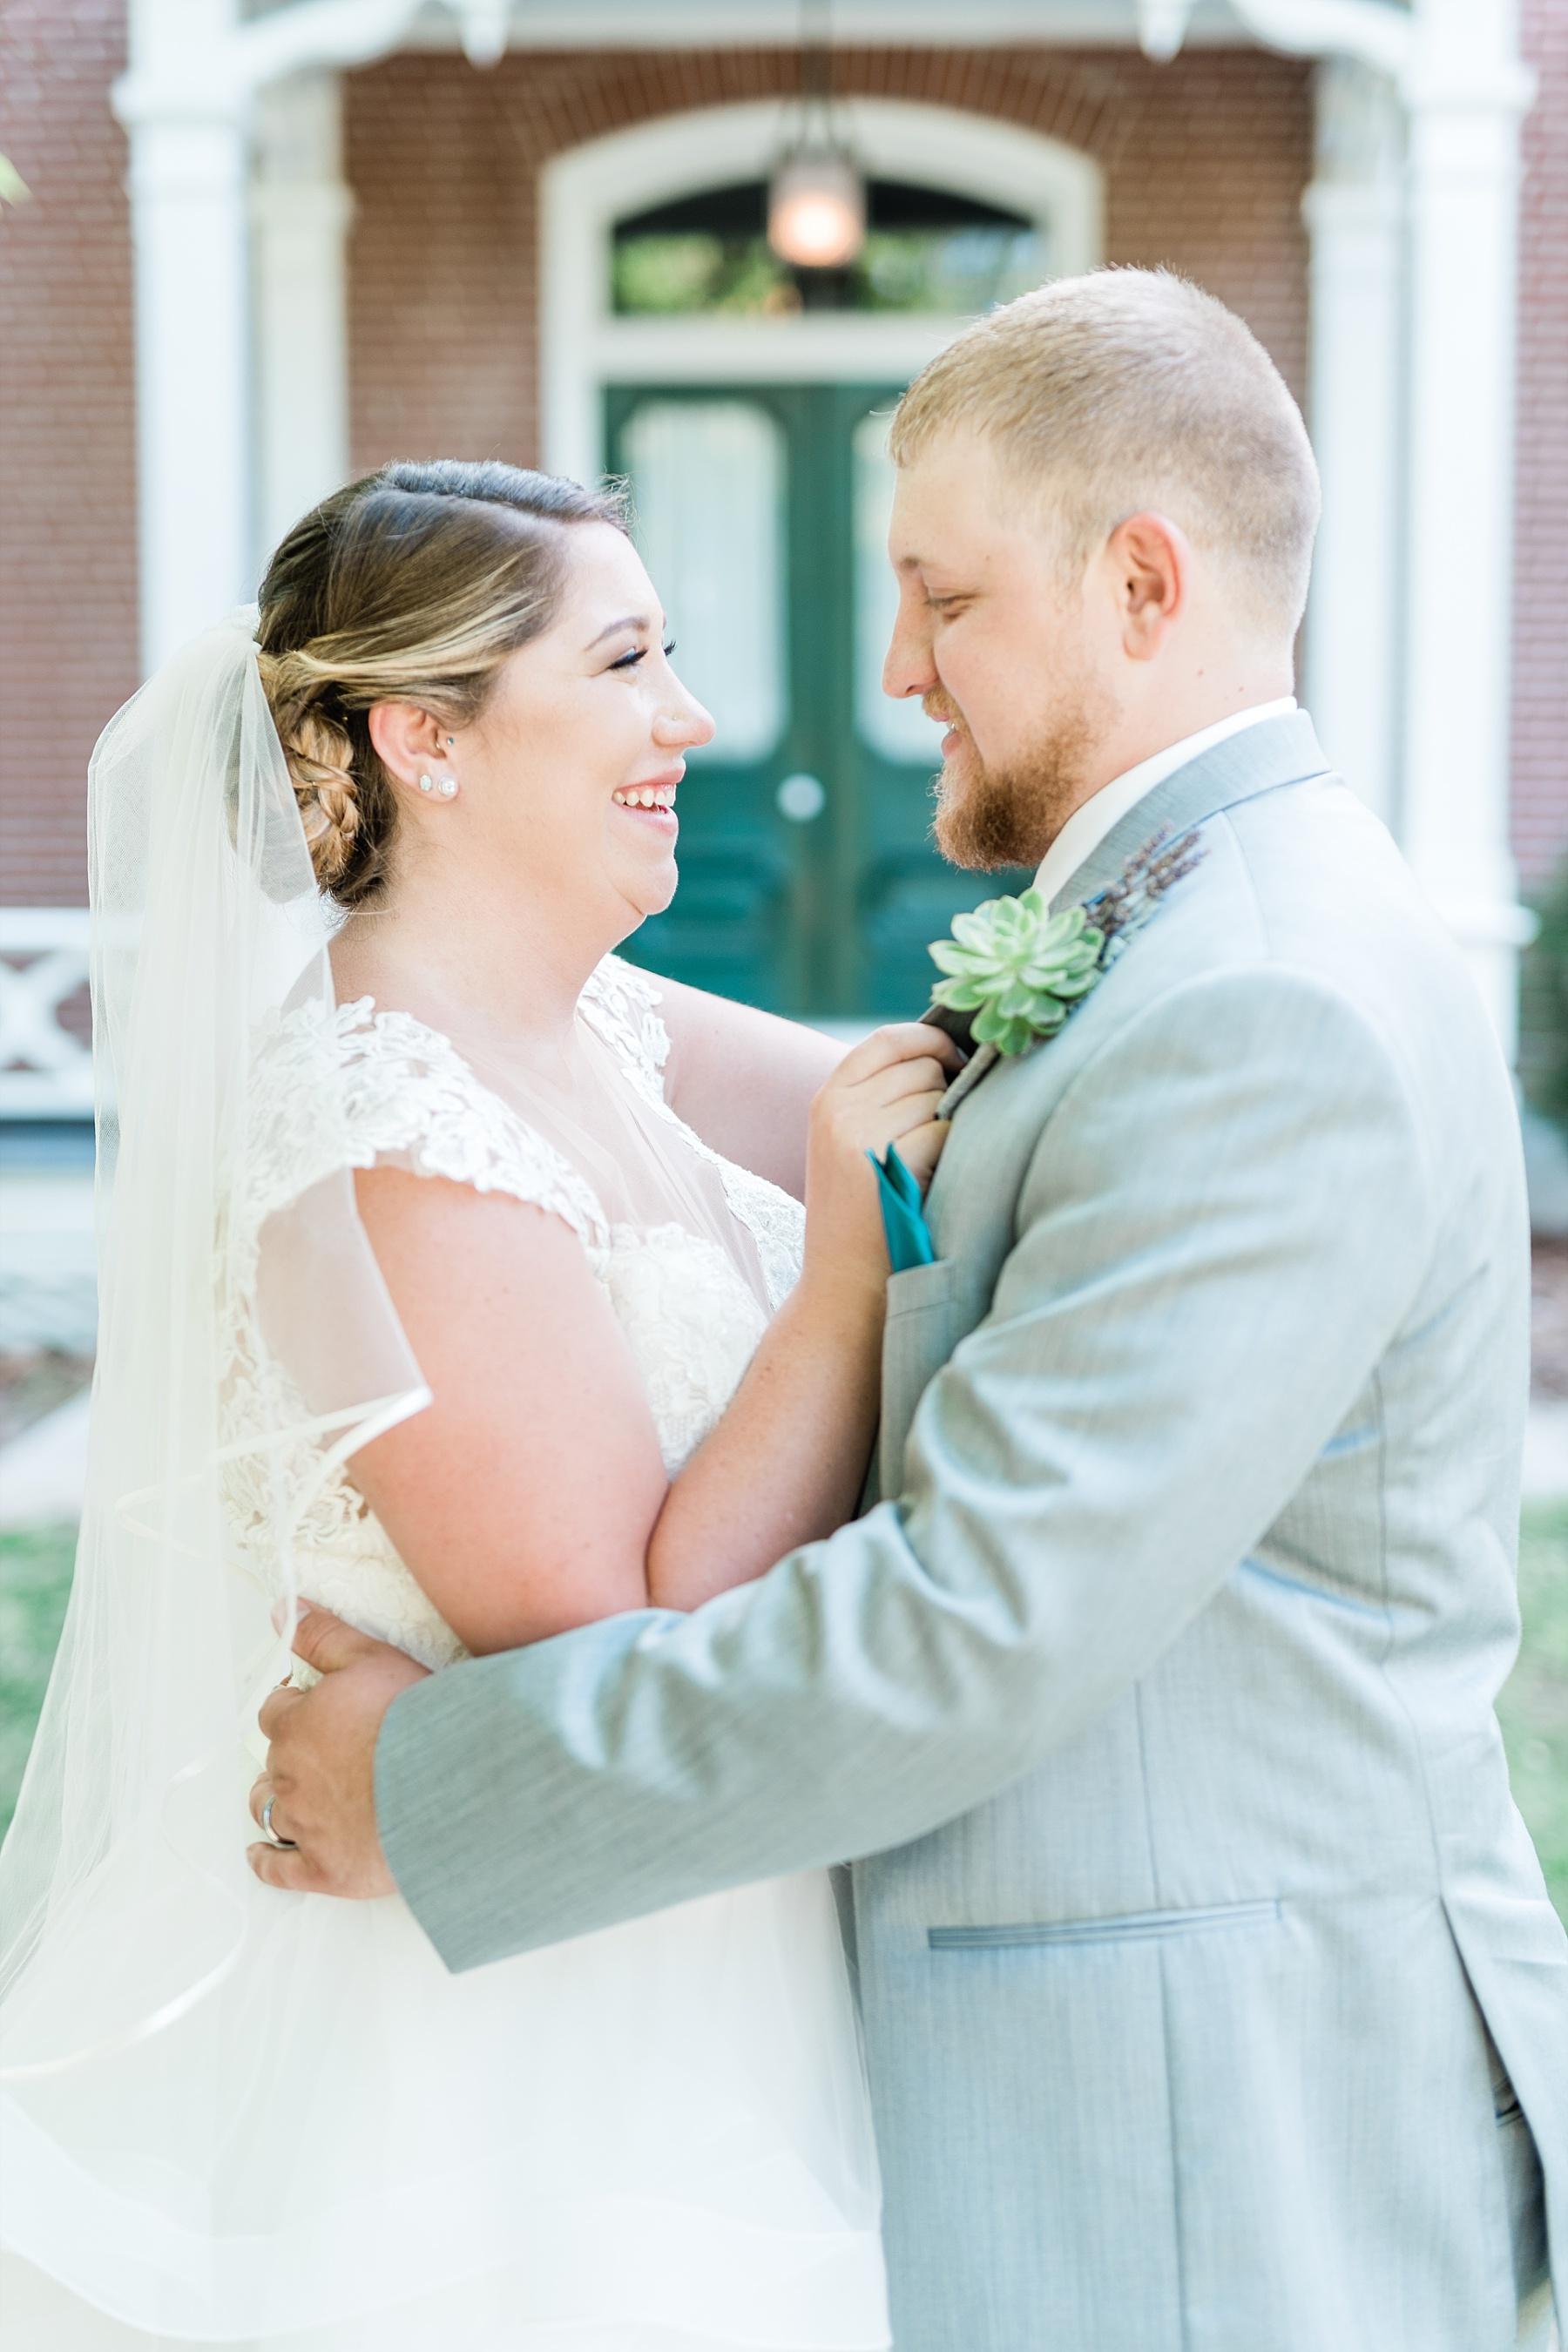 Baurichter Wedding at Stoney Creek Inn Columbia Missouri by Kelsi Kliethermes Photography_0022.jpg